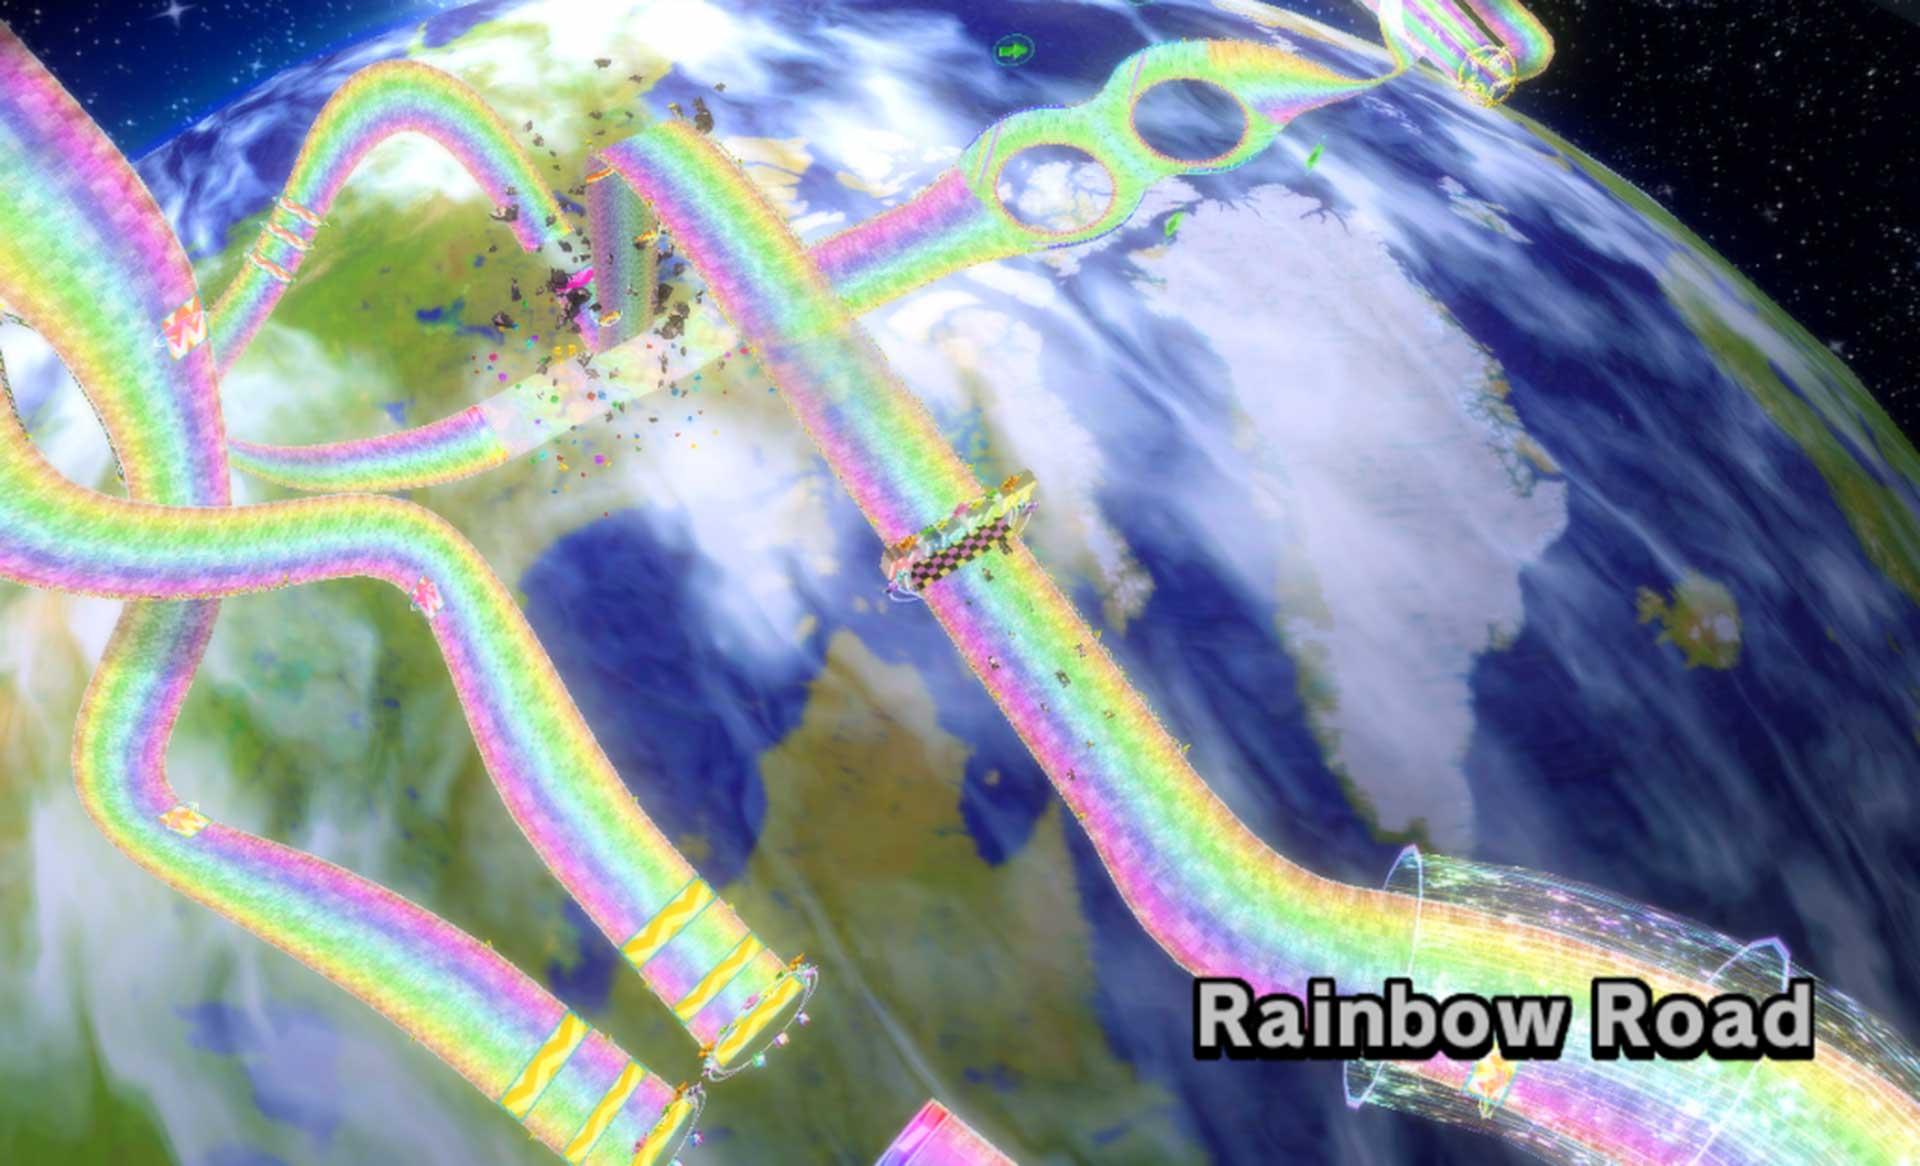 Mario Kart Wii's Rainbow Road.